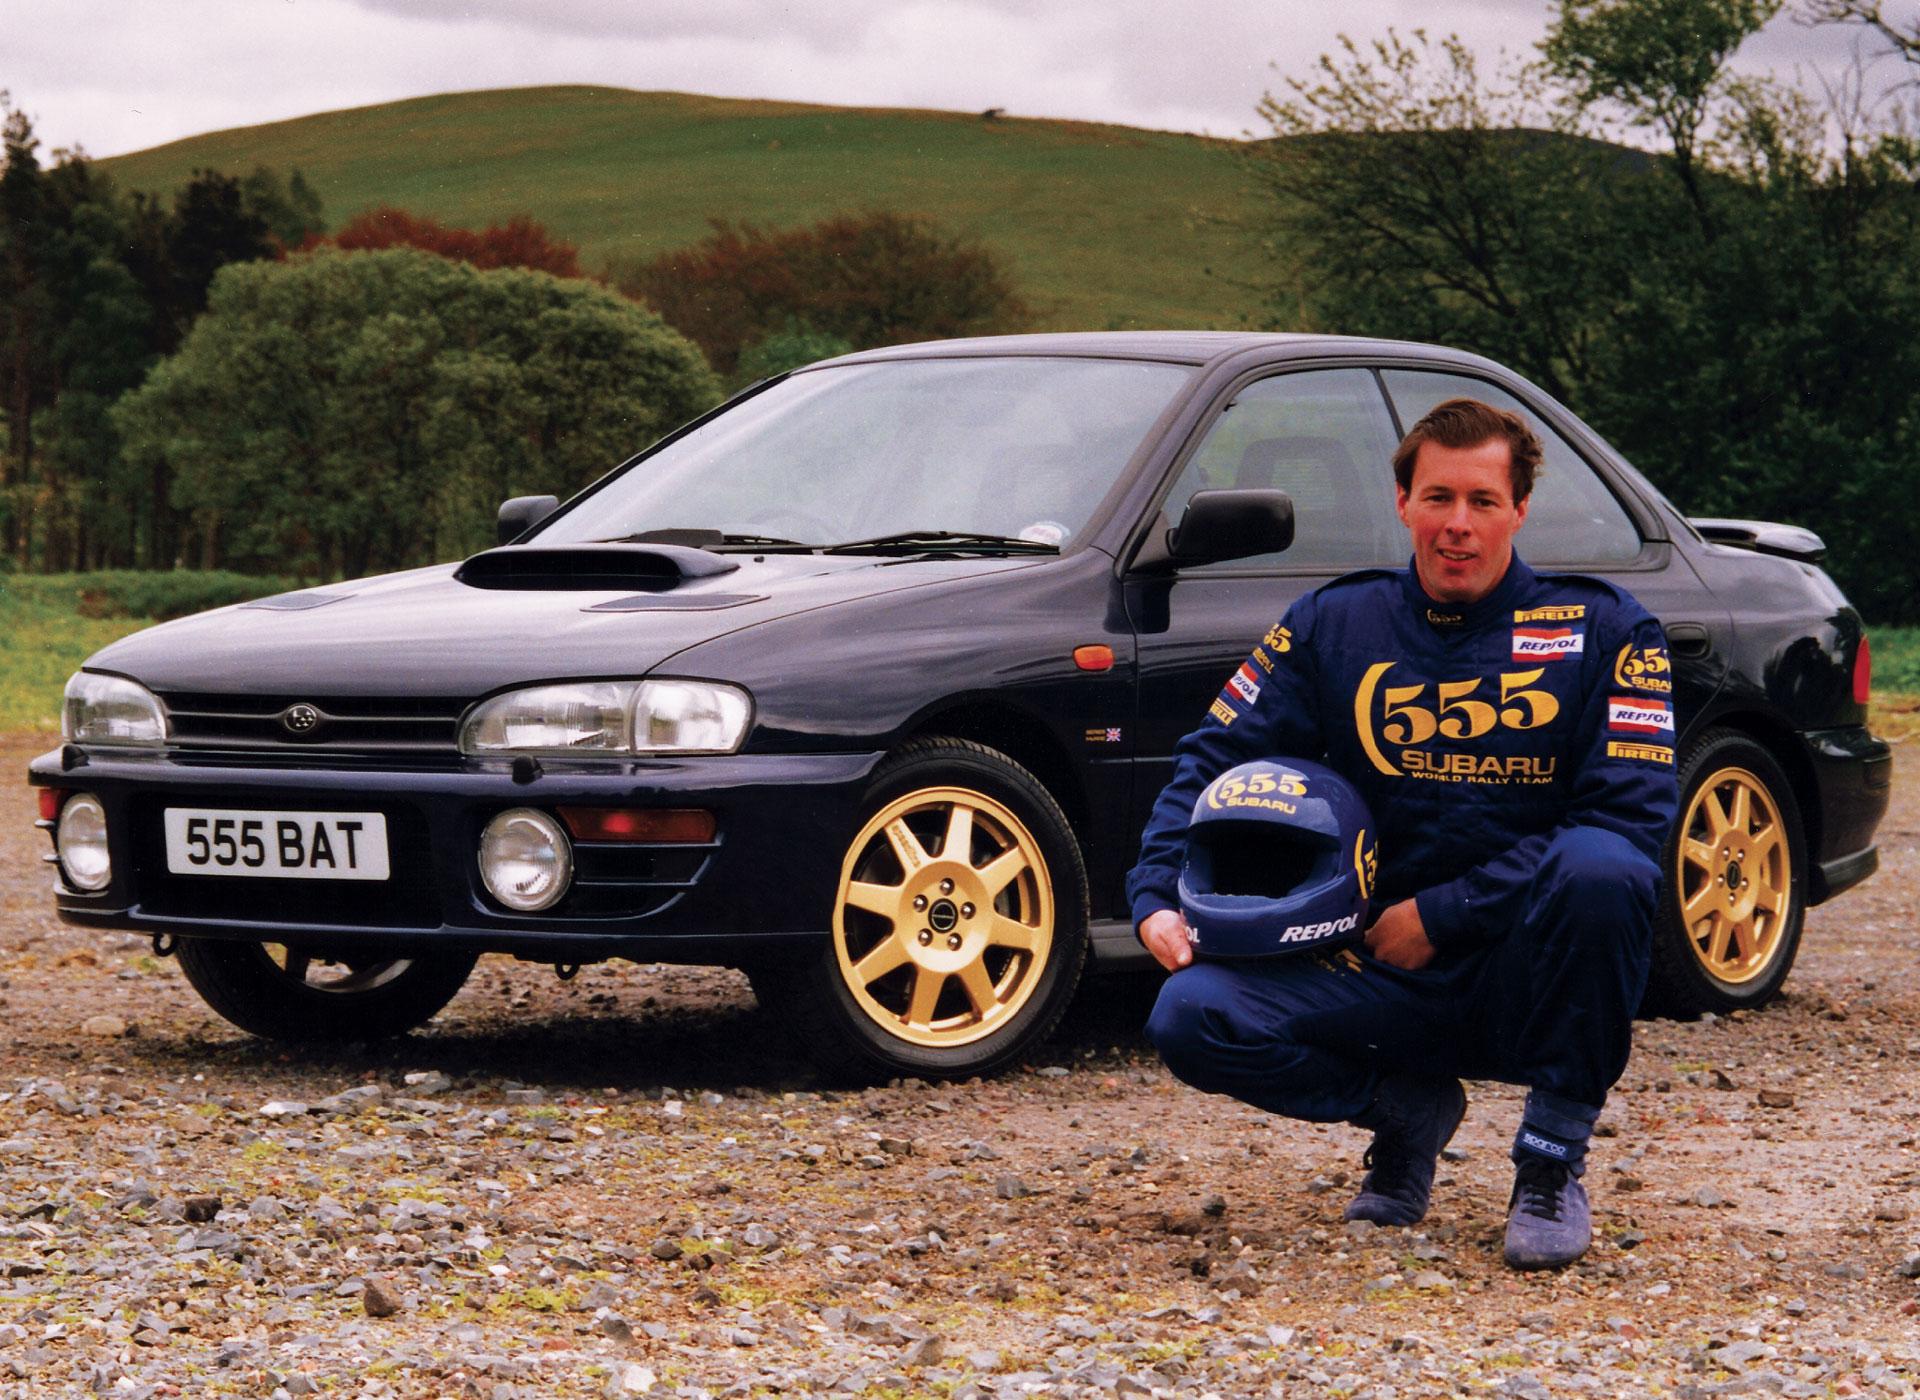 1997 Subaru Impreza WRX